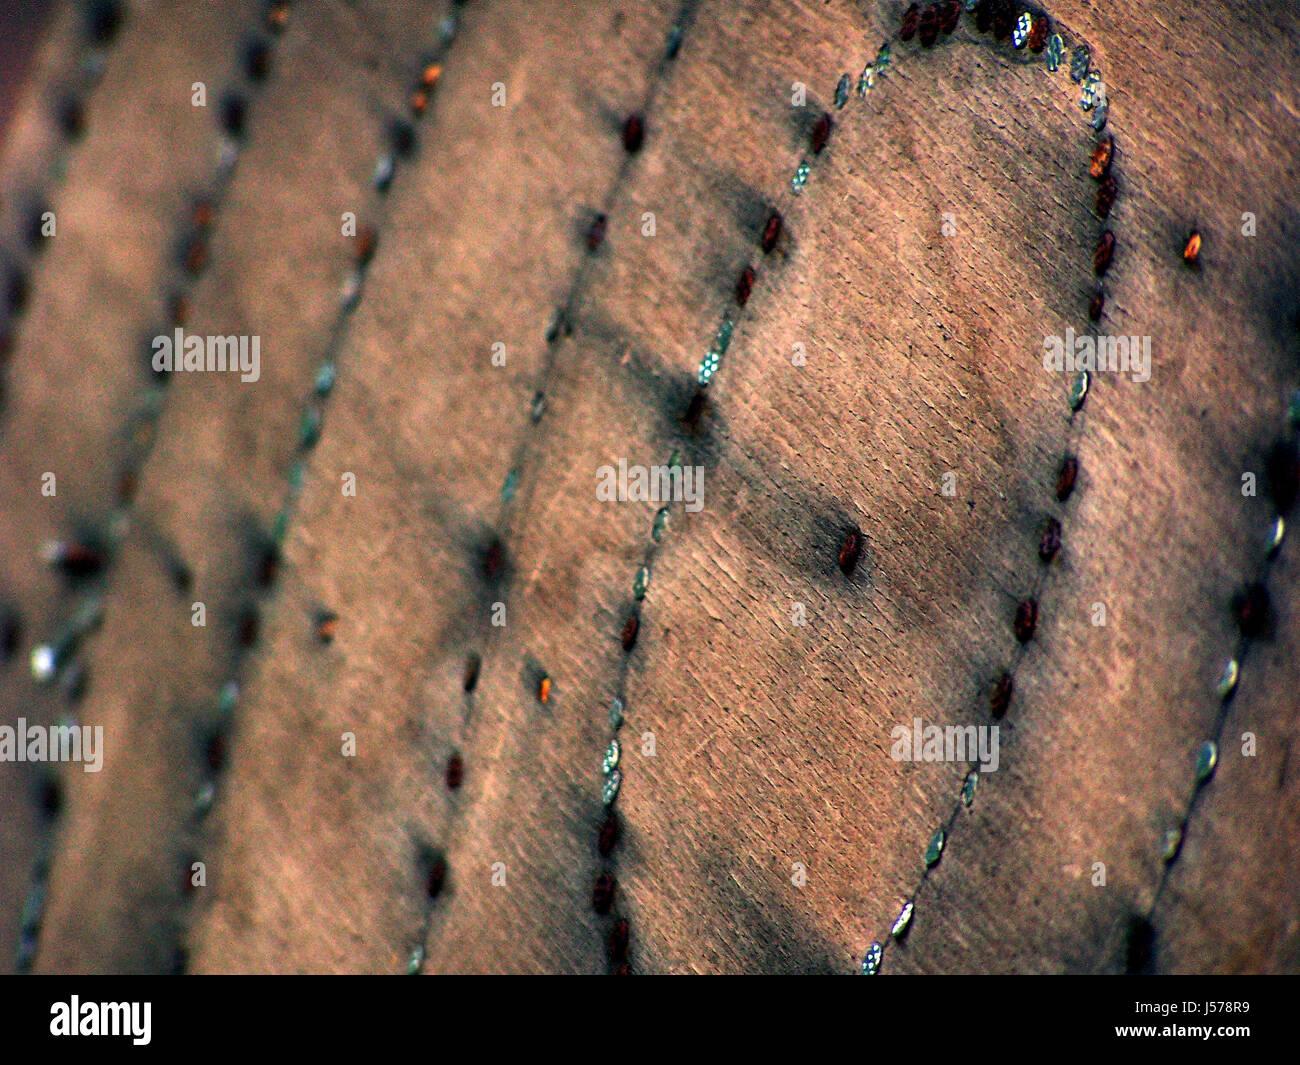 Nagelbild Stockfotos & Nagelbild Bilder - Alamy